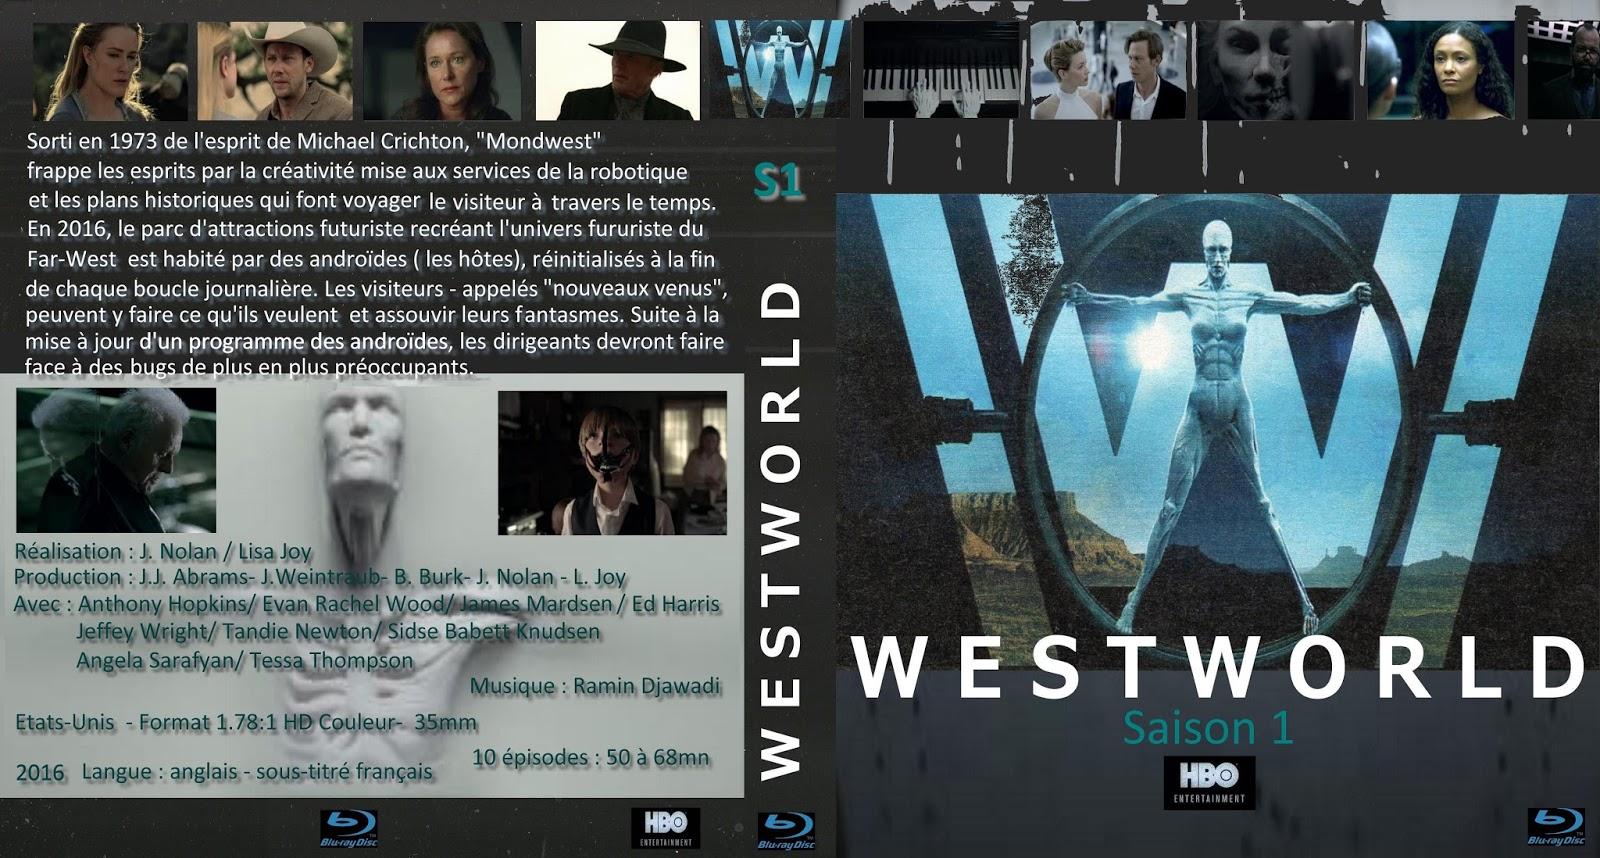 westworld saison 1